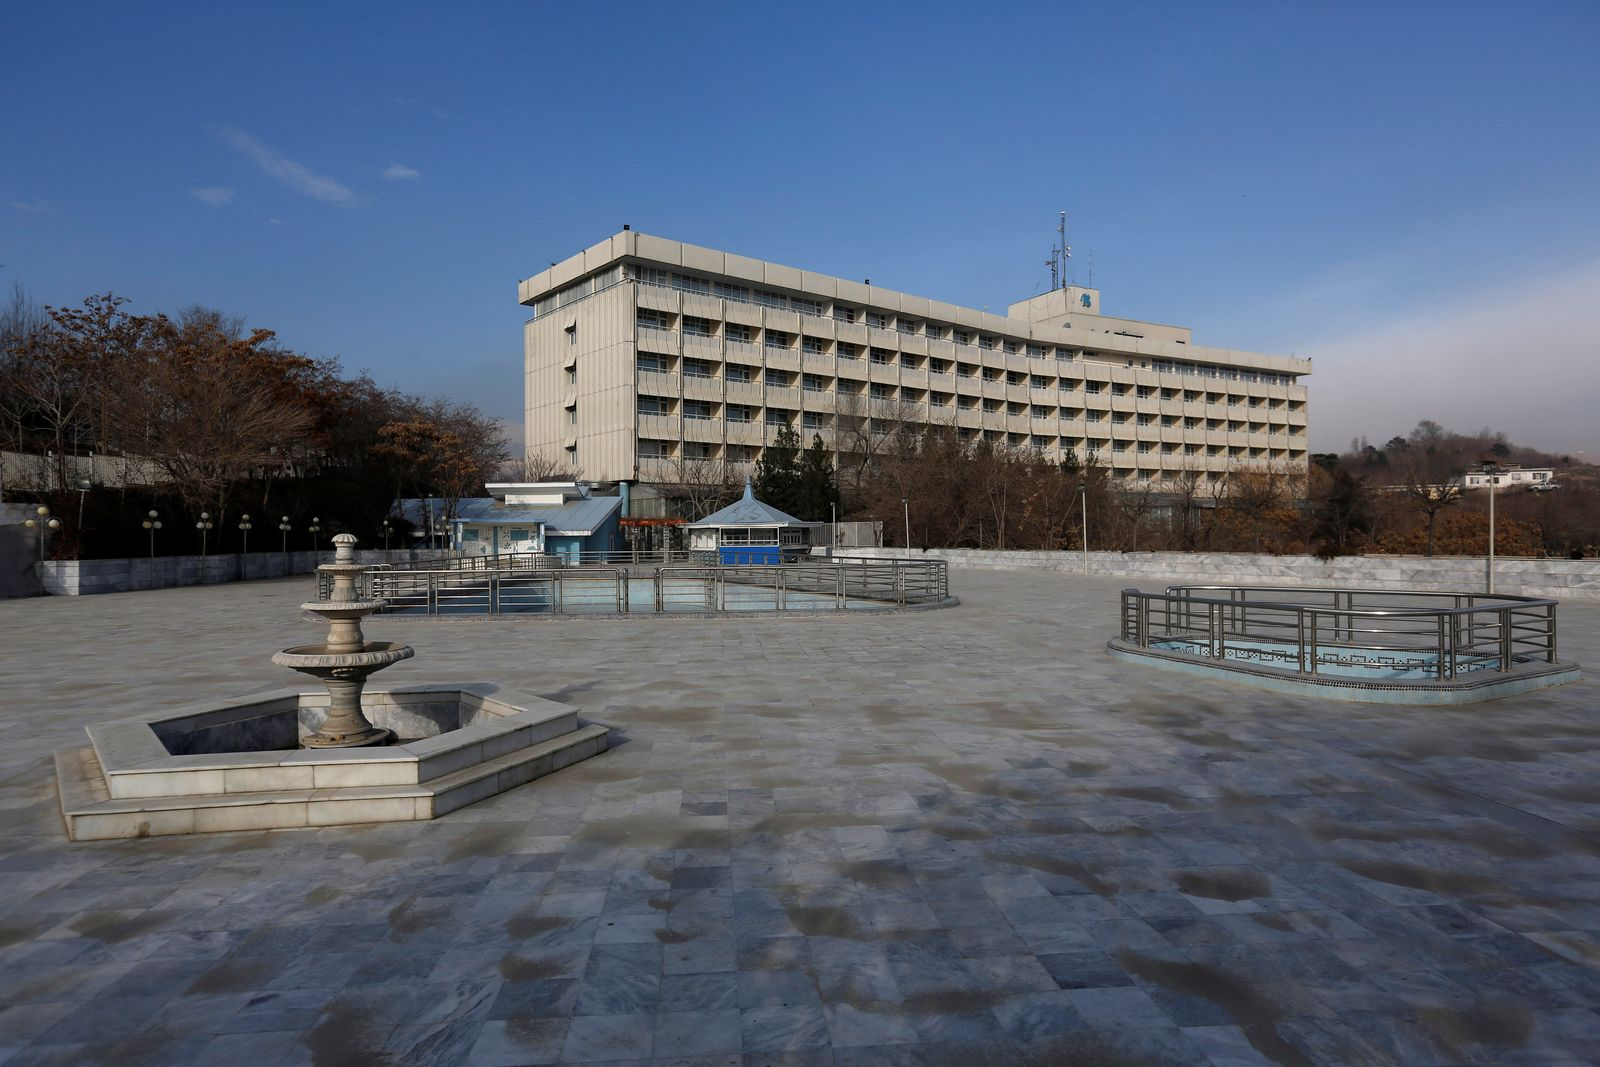 Kabul Hotel Angriff